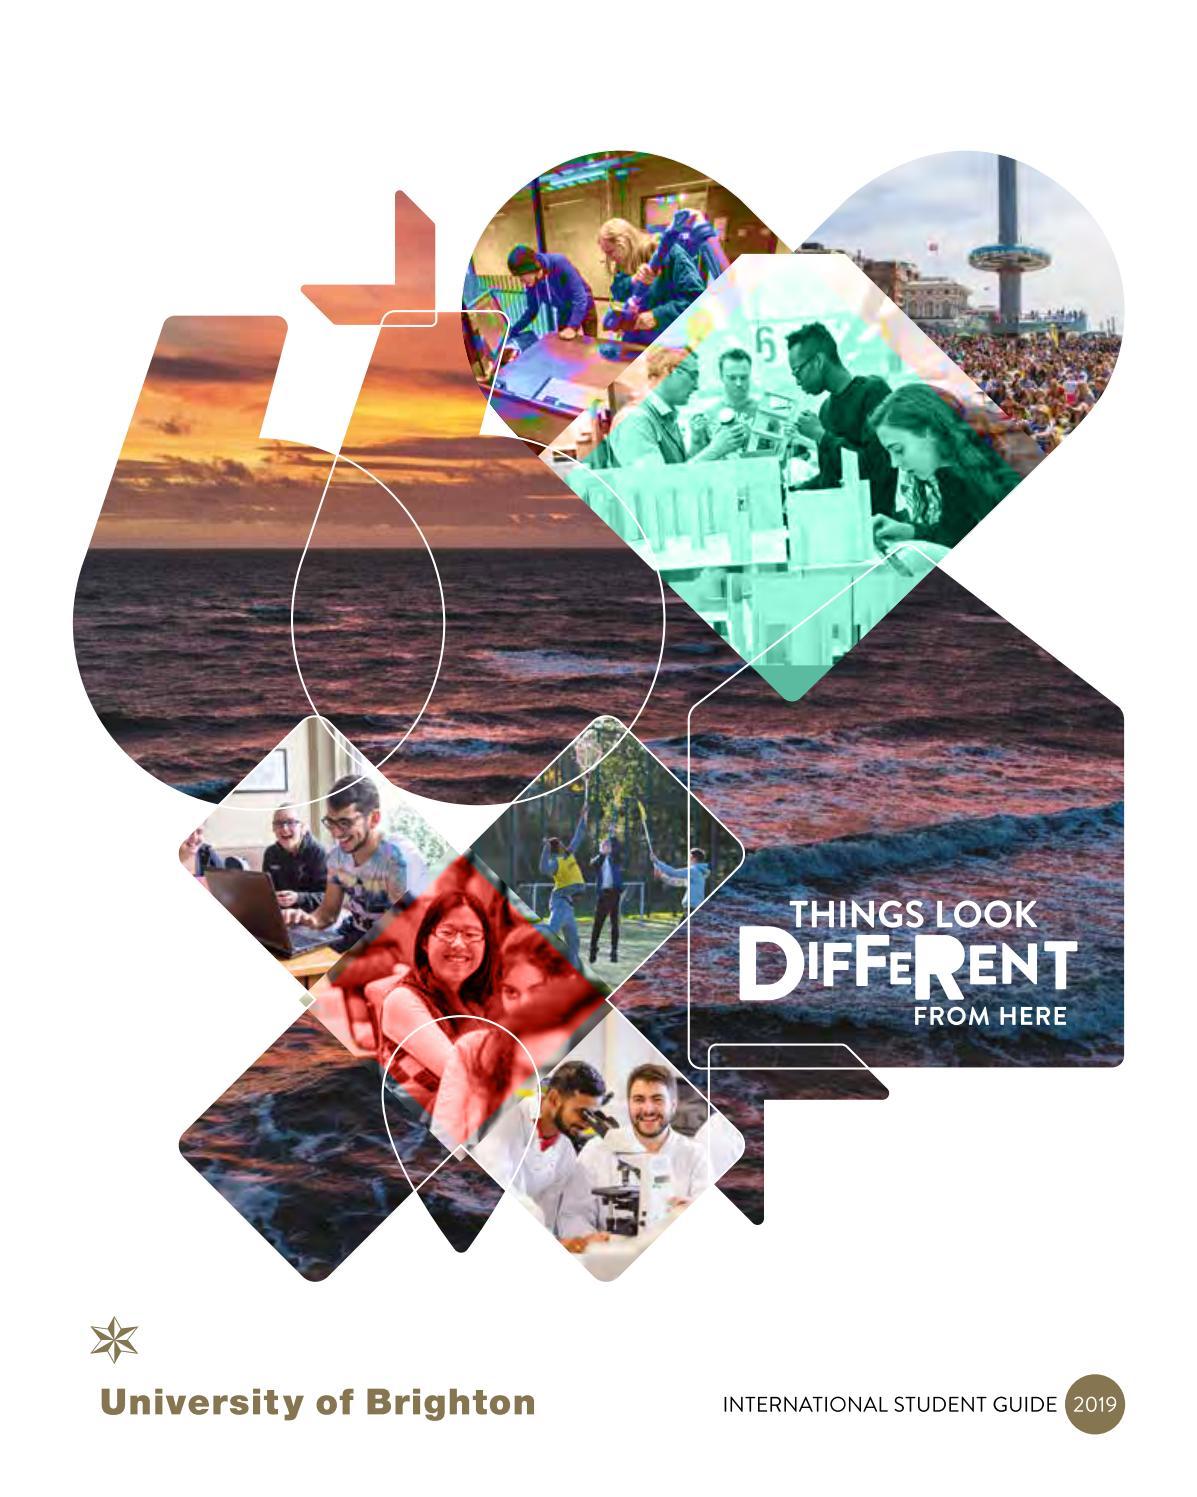 International Student Guide 2019 By University Of Brighton Issuu